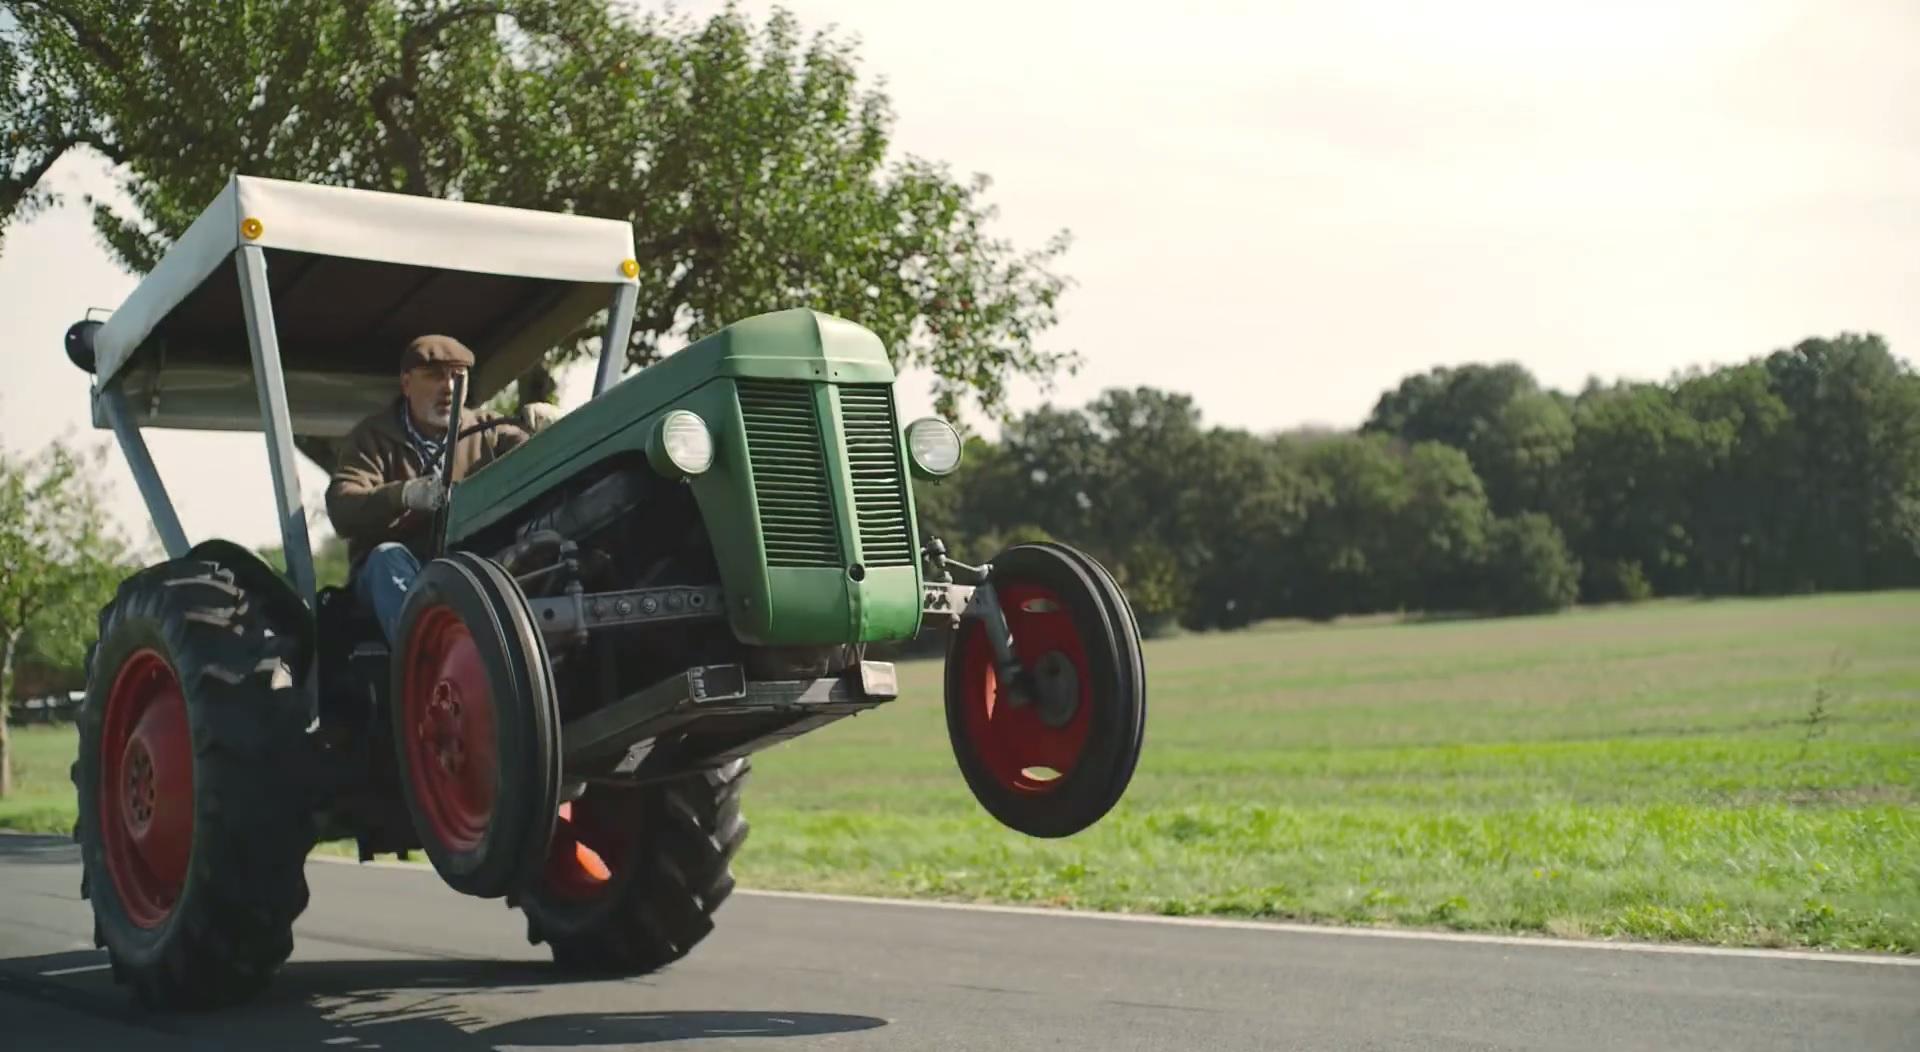 http://www.1gai.ru/uploads/posts/2015-10/1445546901_tractors.jpg